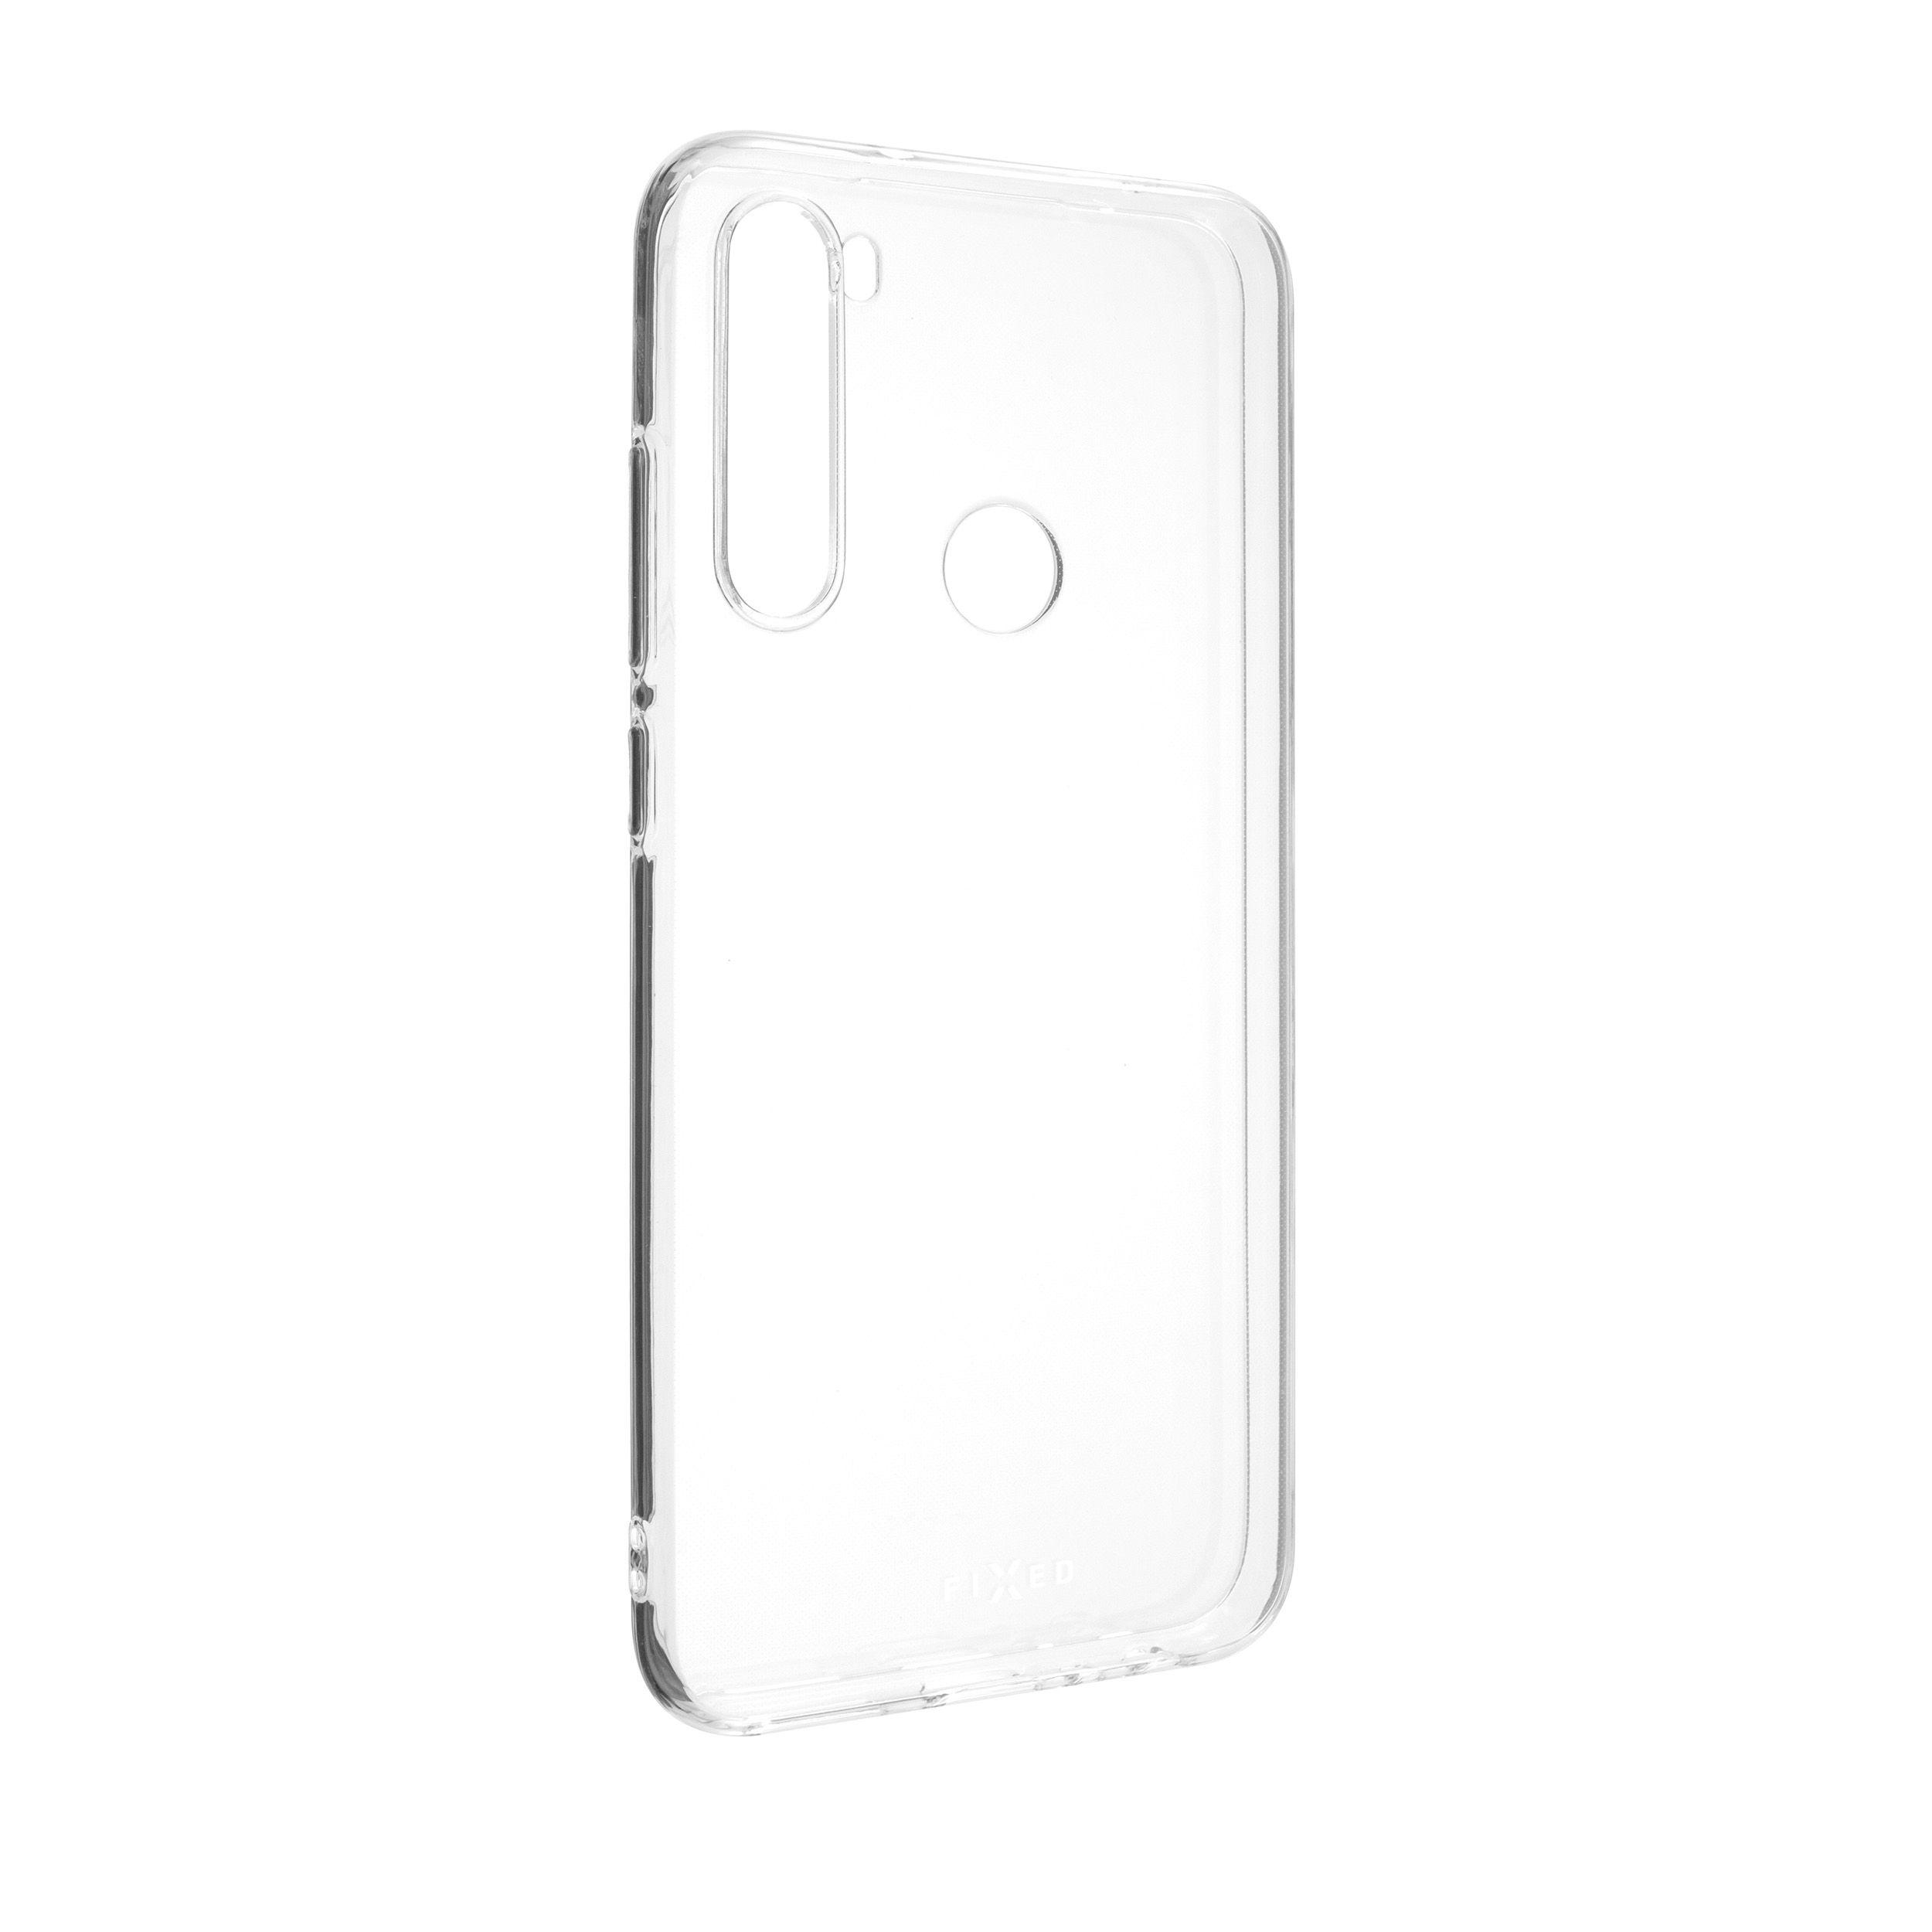 Ultratenké TPU gelové pouzdro FIXED Skin pro Xiaomi Redmi Note 8T, 0,6 mm, čiré